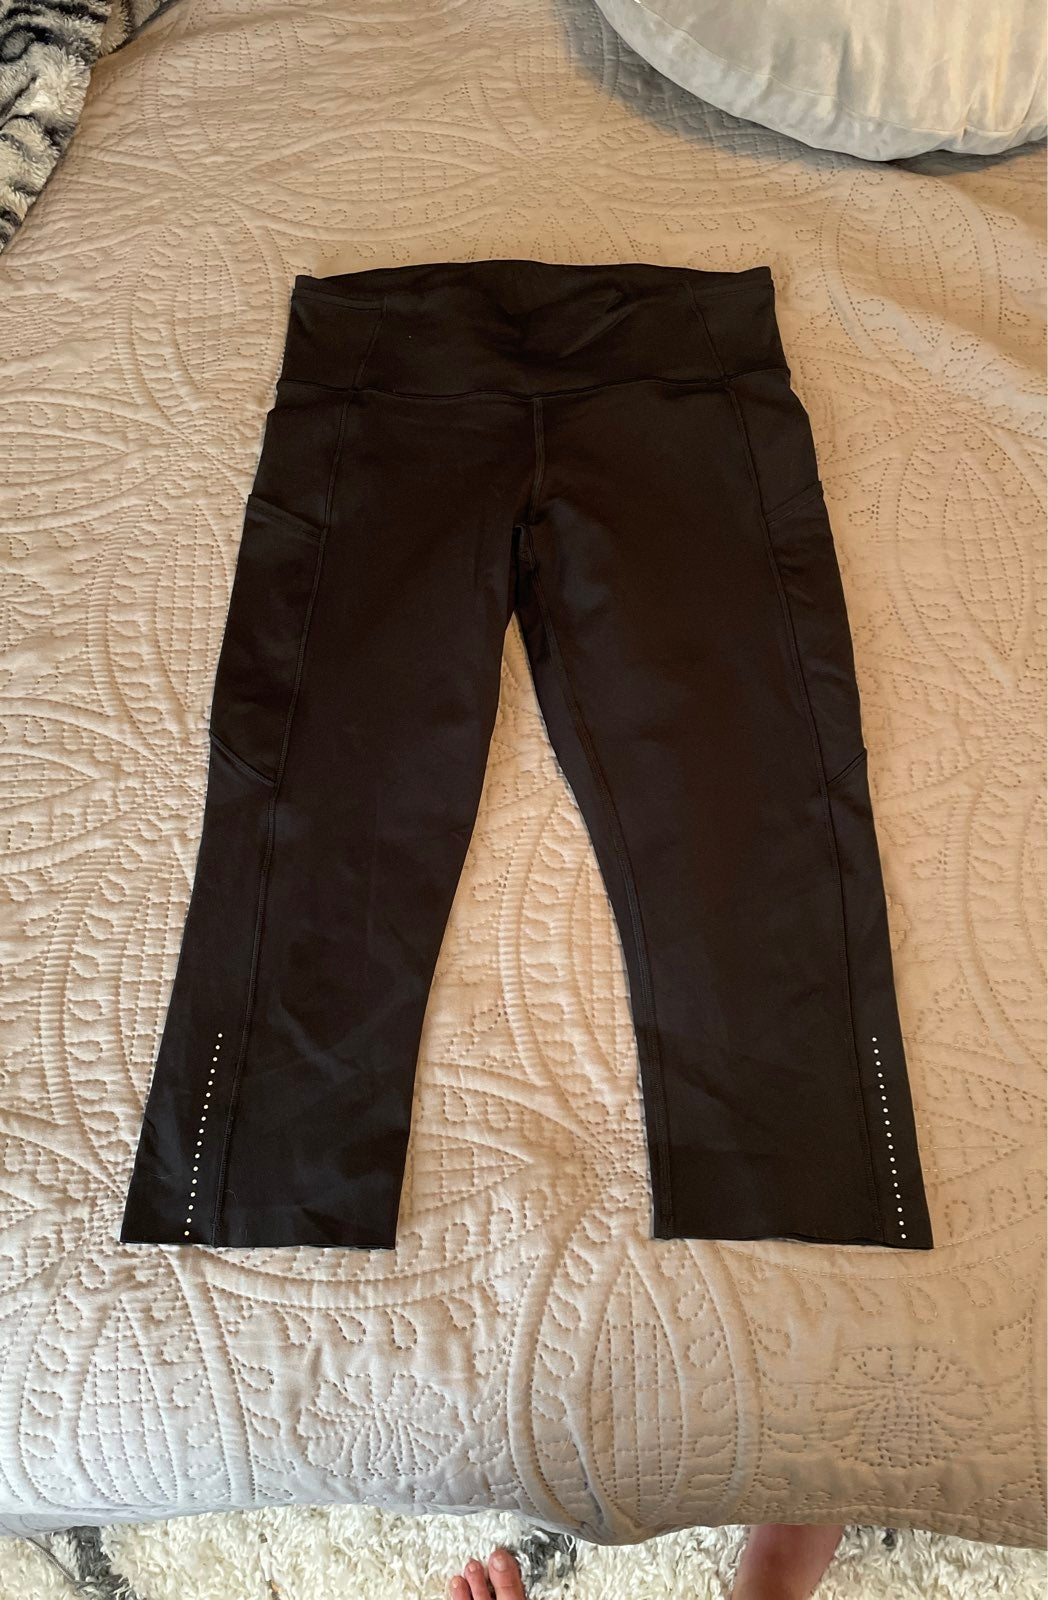 Lululemon fast and free crop leggings